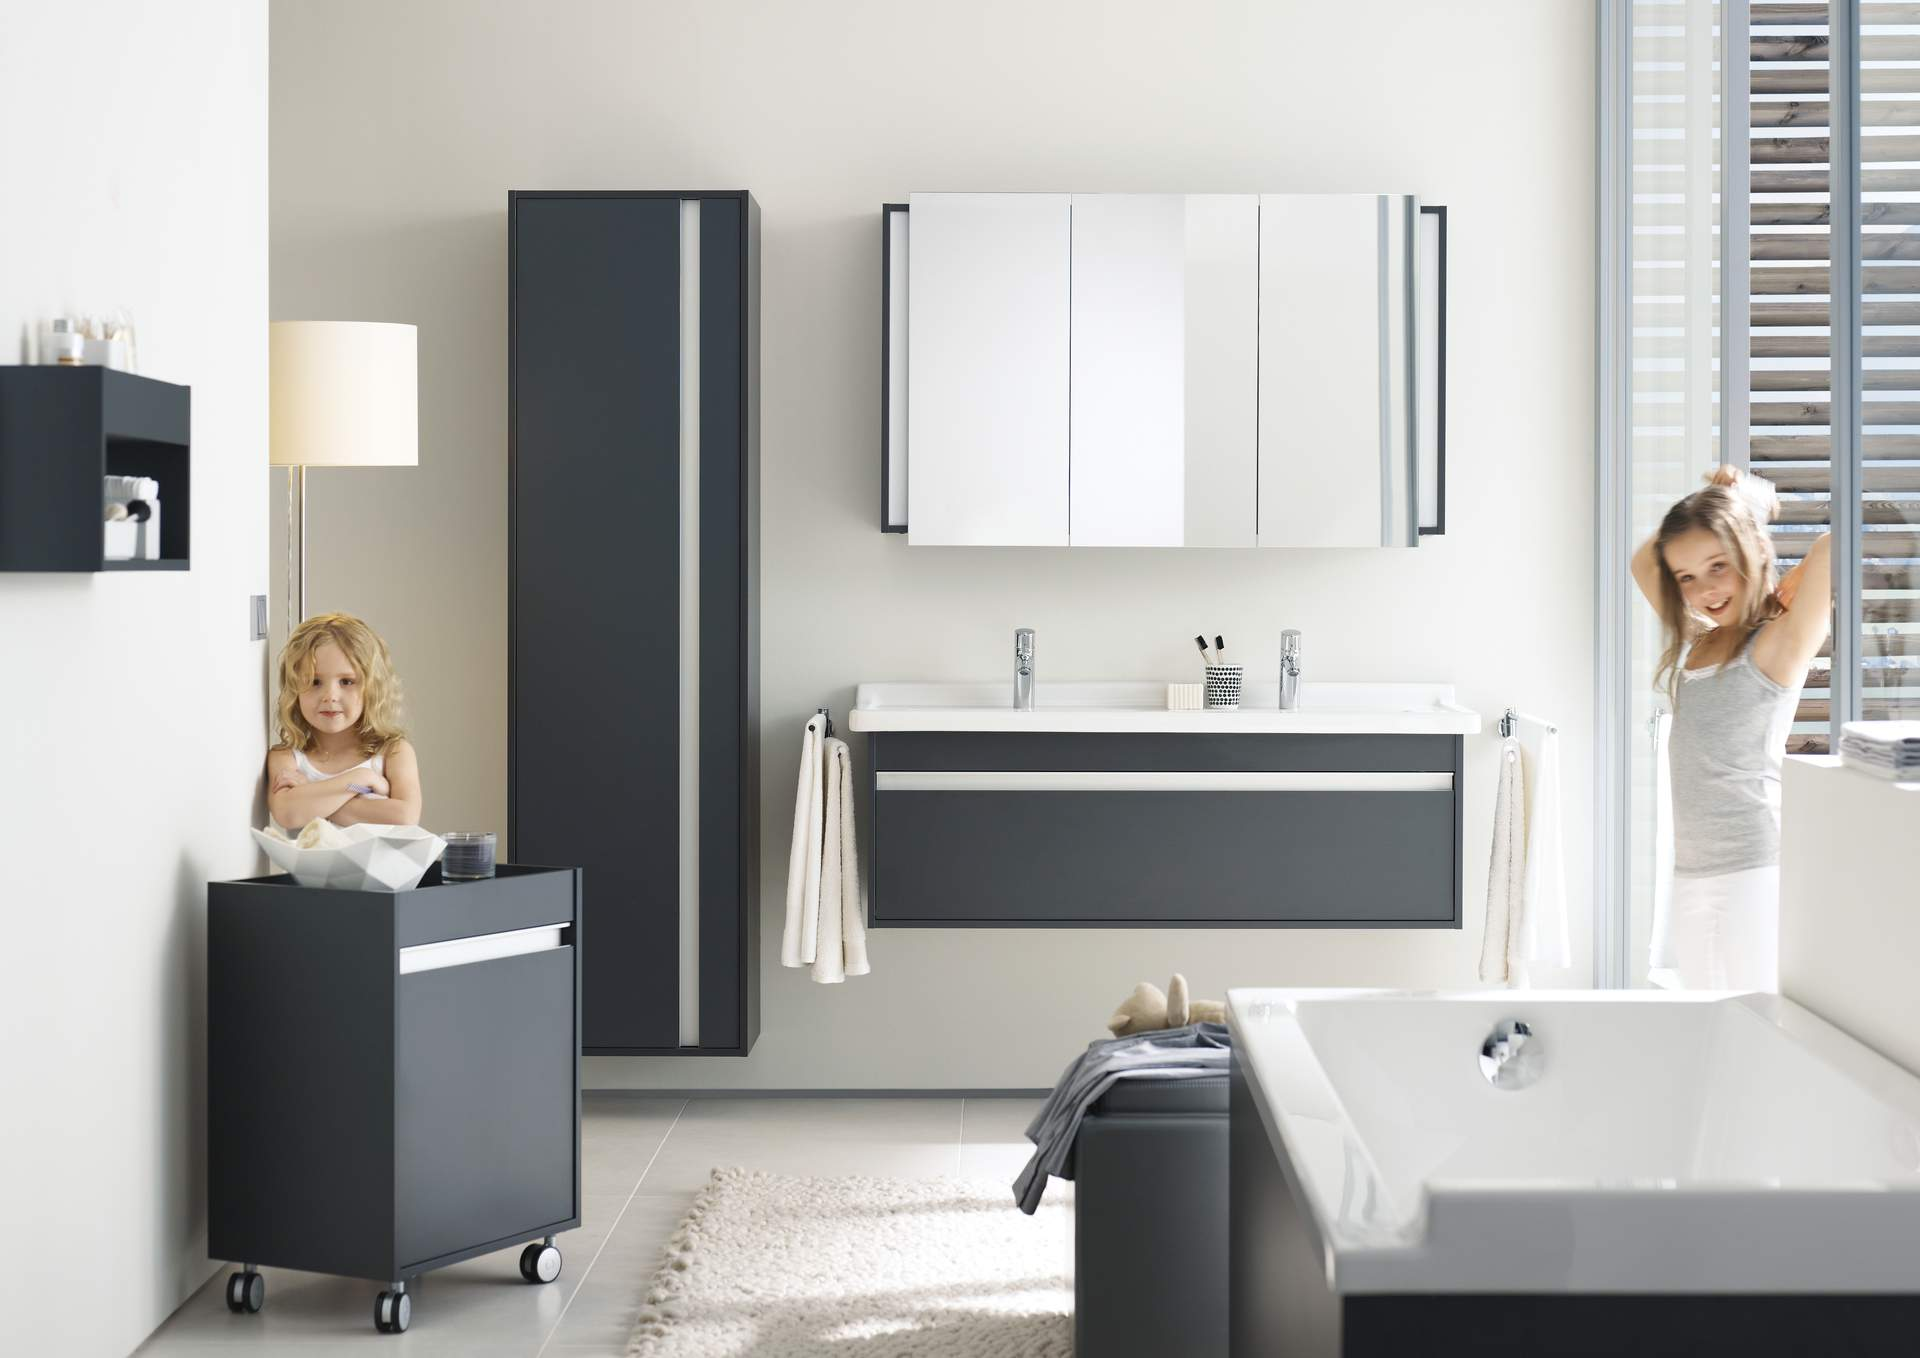 Ordinaire Duravit Ketho: Bathroom Furniture By Christian Werner   Duravit